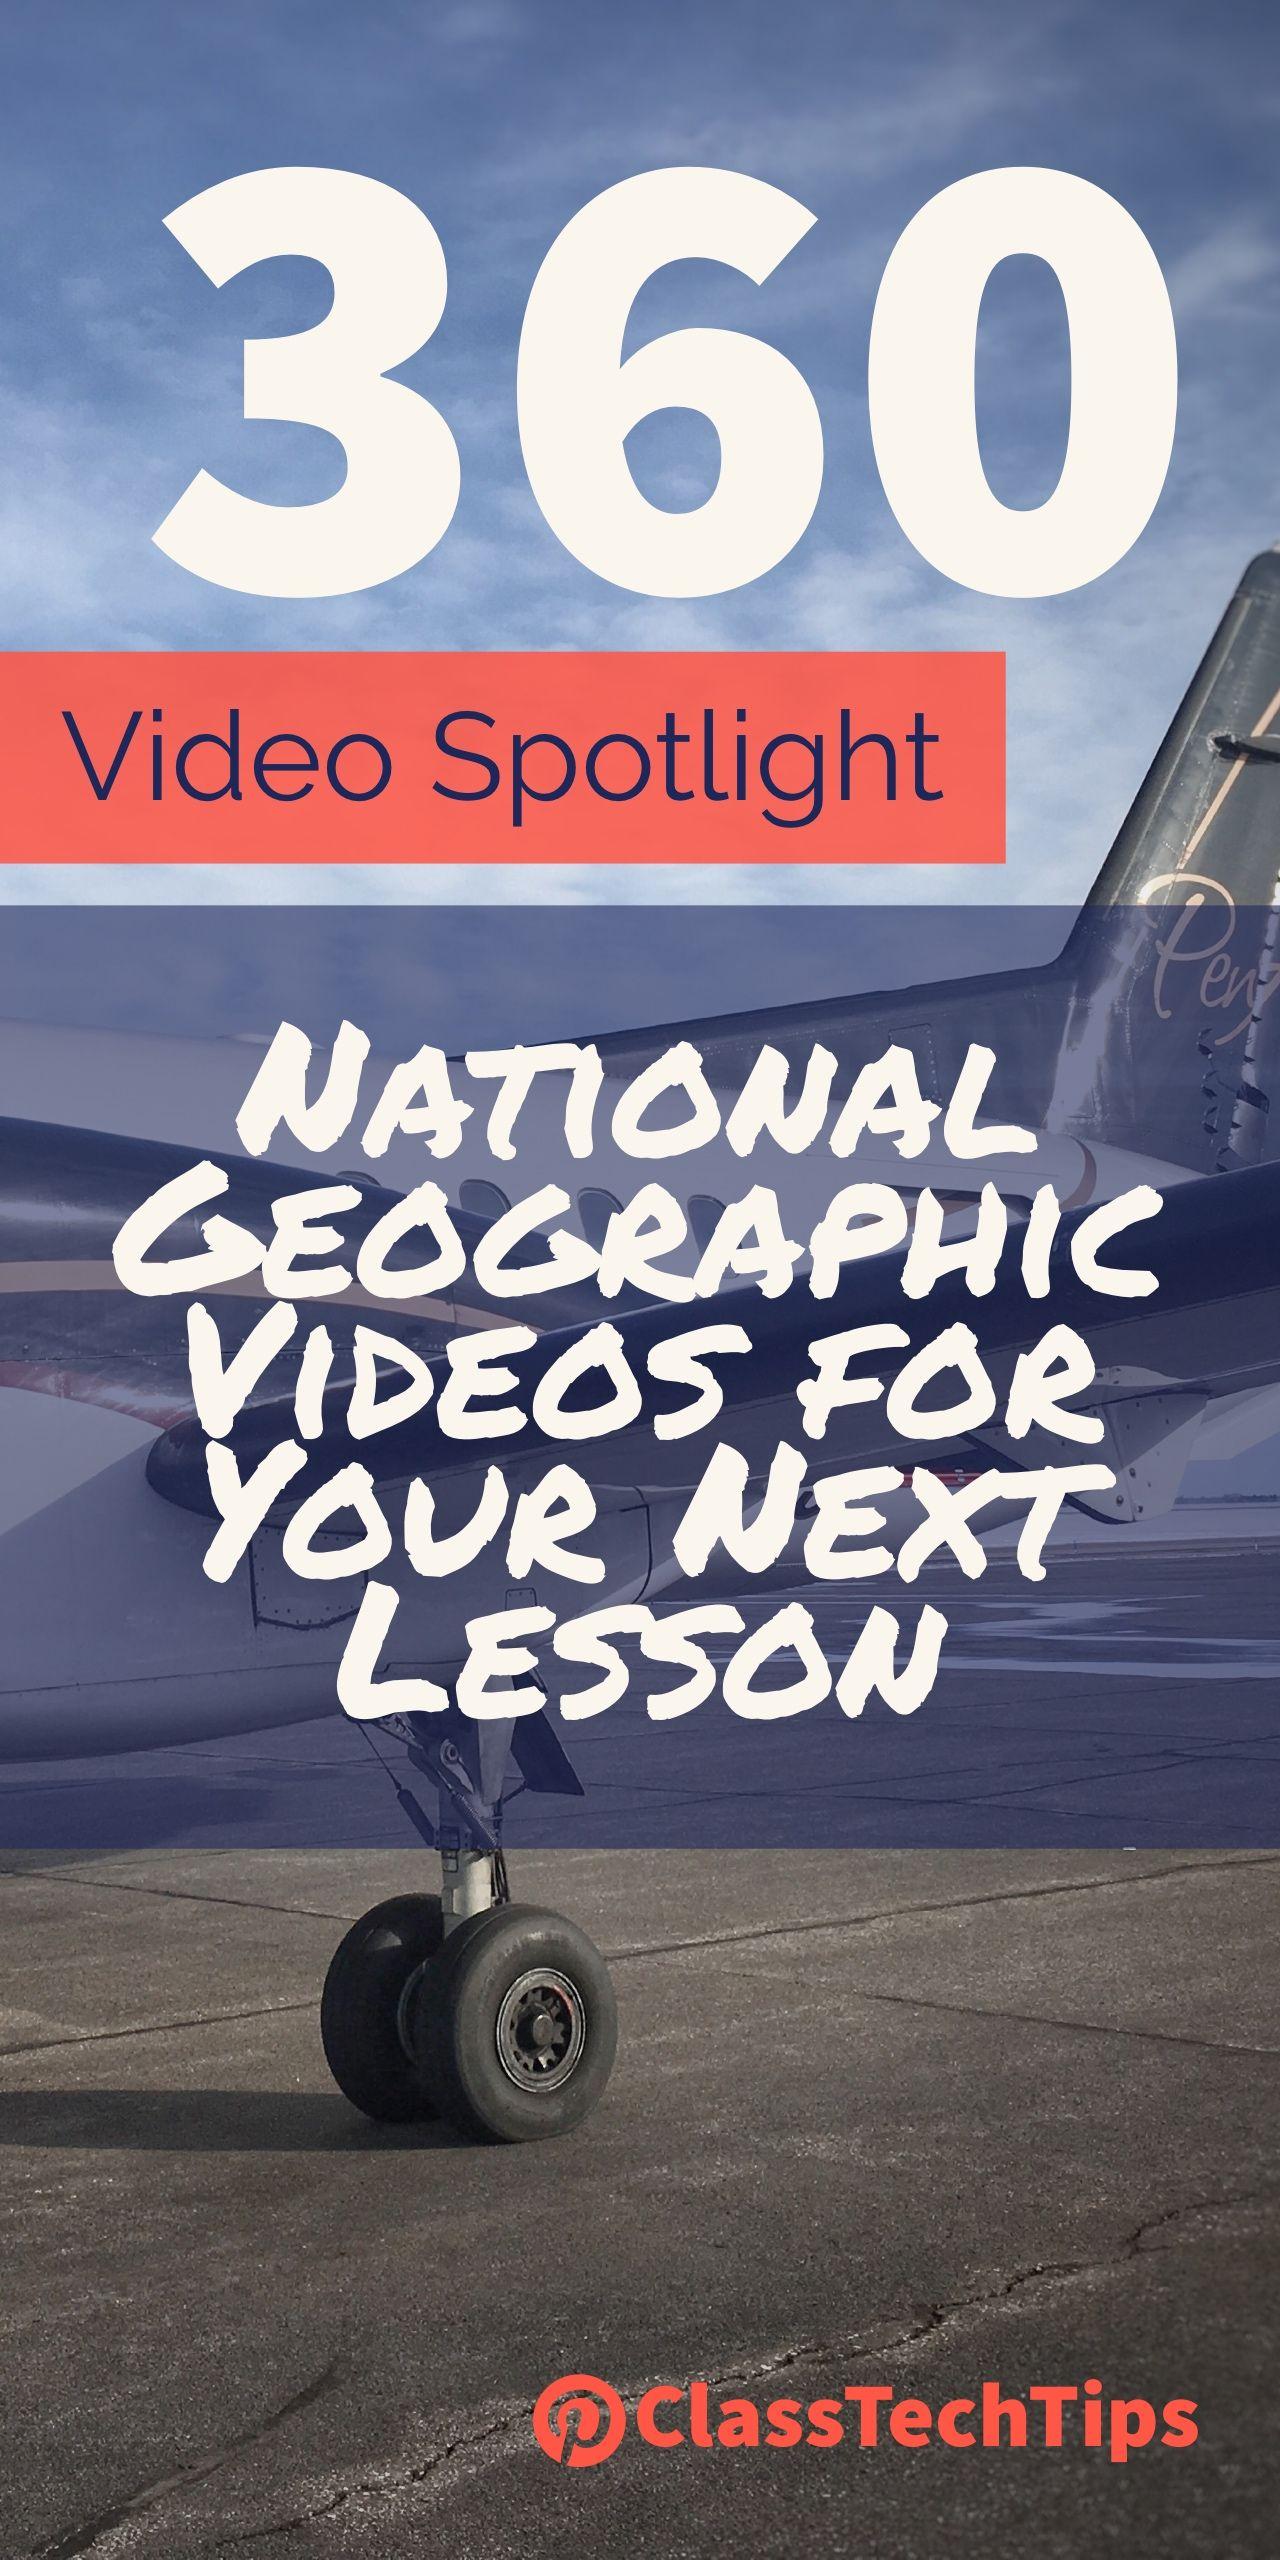 Nat Geo | National Geographic Videos | 360 Videos | Virtual Reality | Social Studies Videos | Science Videos